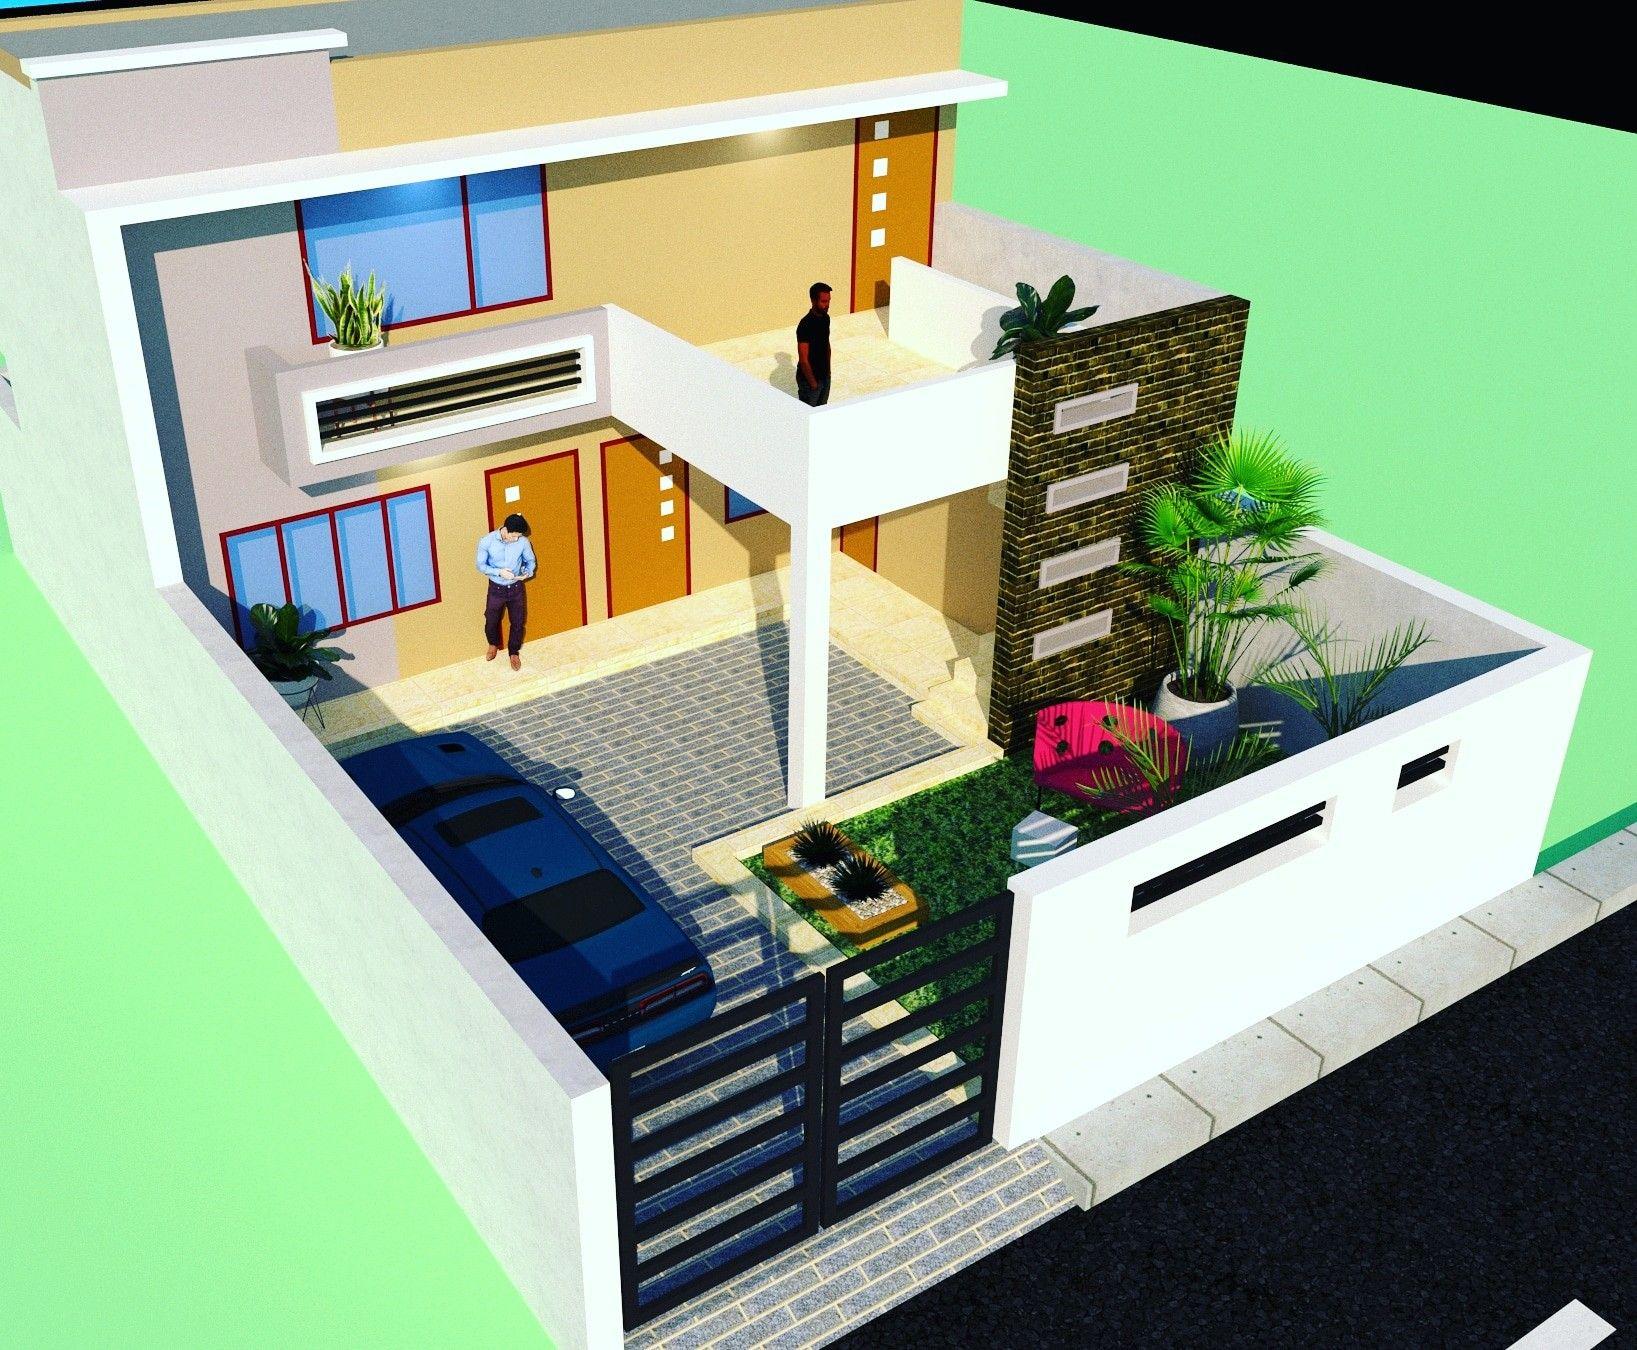 #housedesign #architecture #homedecor #exterior #homeelevation #houseideas #buildohome #designforhomes #homeexterior #houseexterior #sketchup3d #sketchuphome #proparty #smallfarmhouse #houseexterior #sketchup